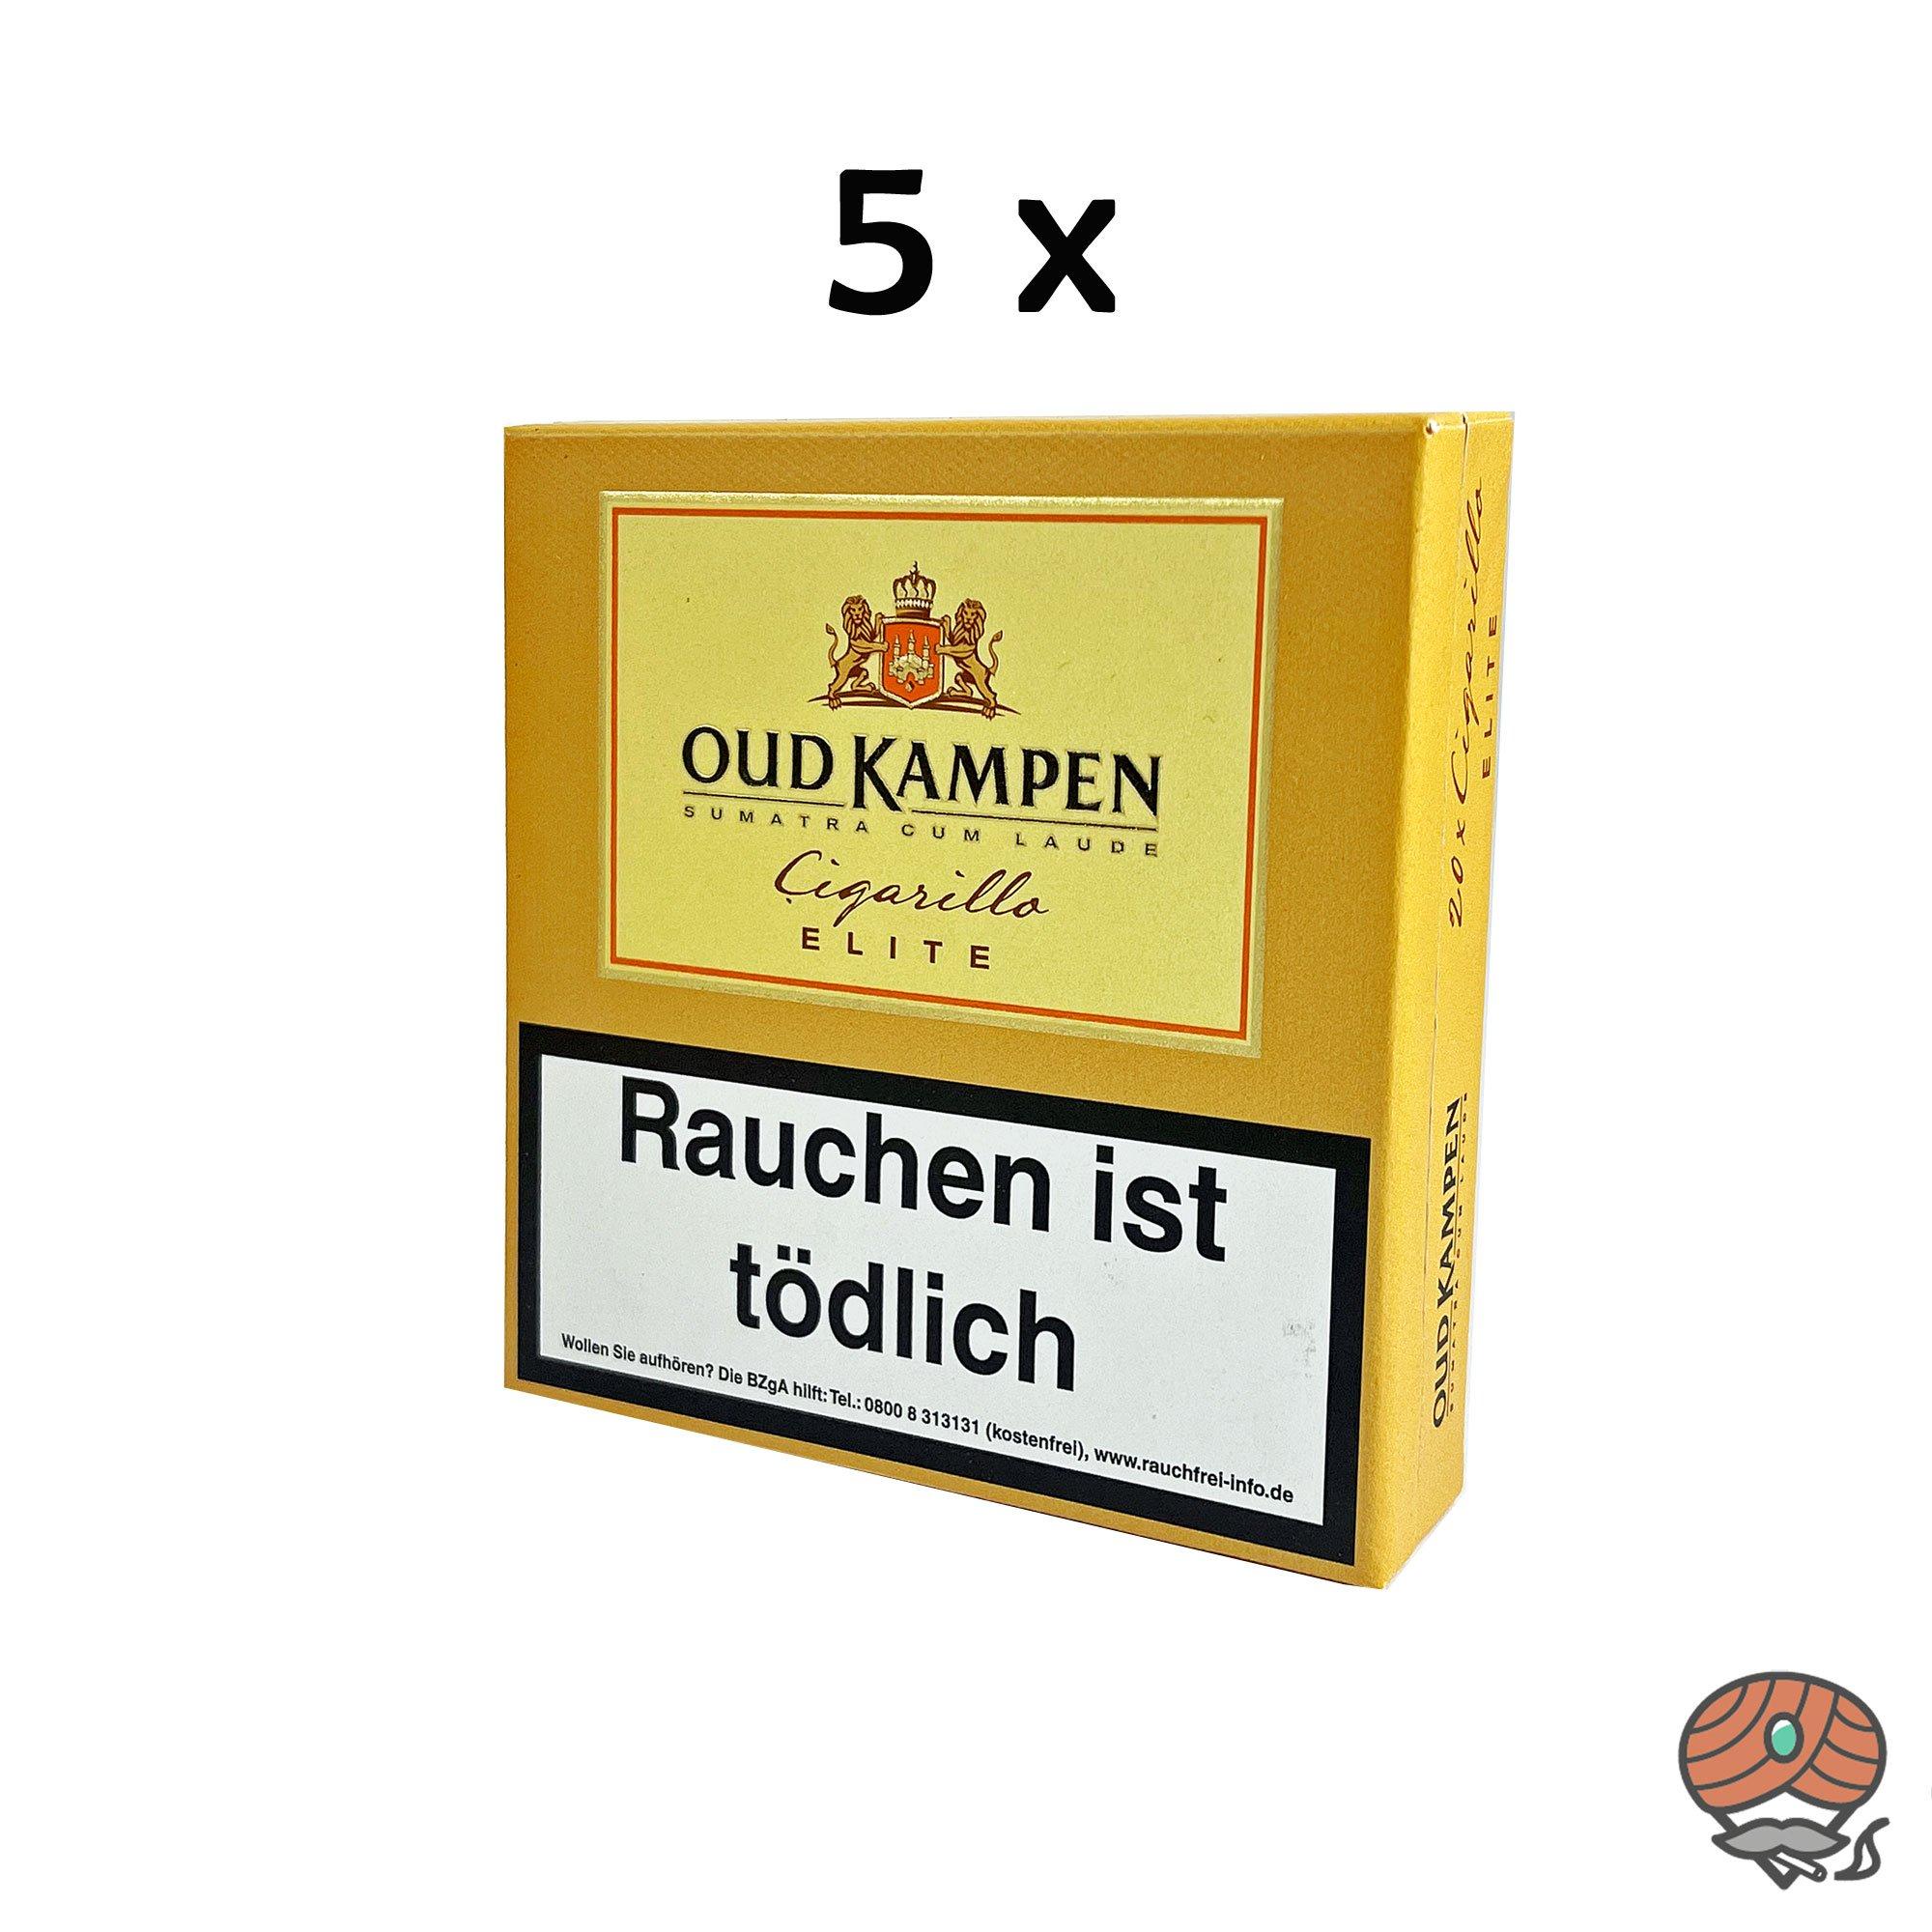 5x Oud Kampen Elite Zigarillos Sumatra Cum Laude 100% Tabak